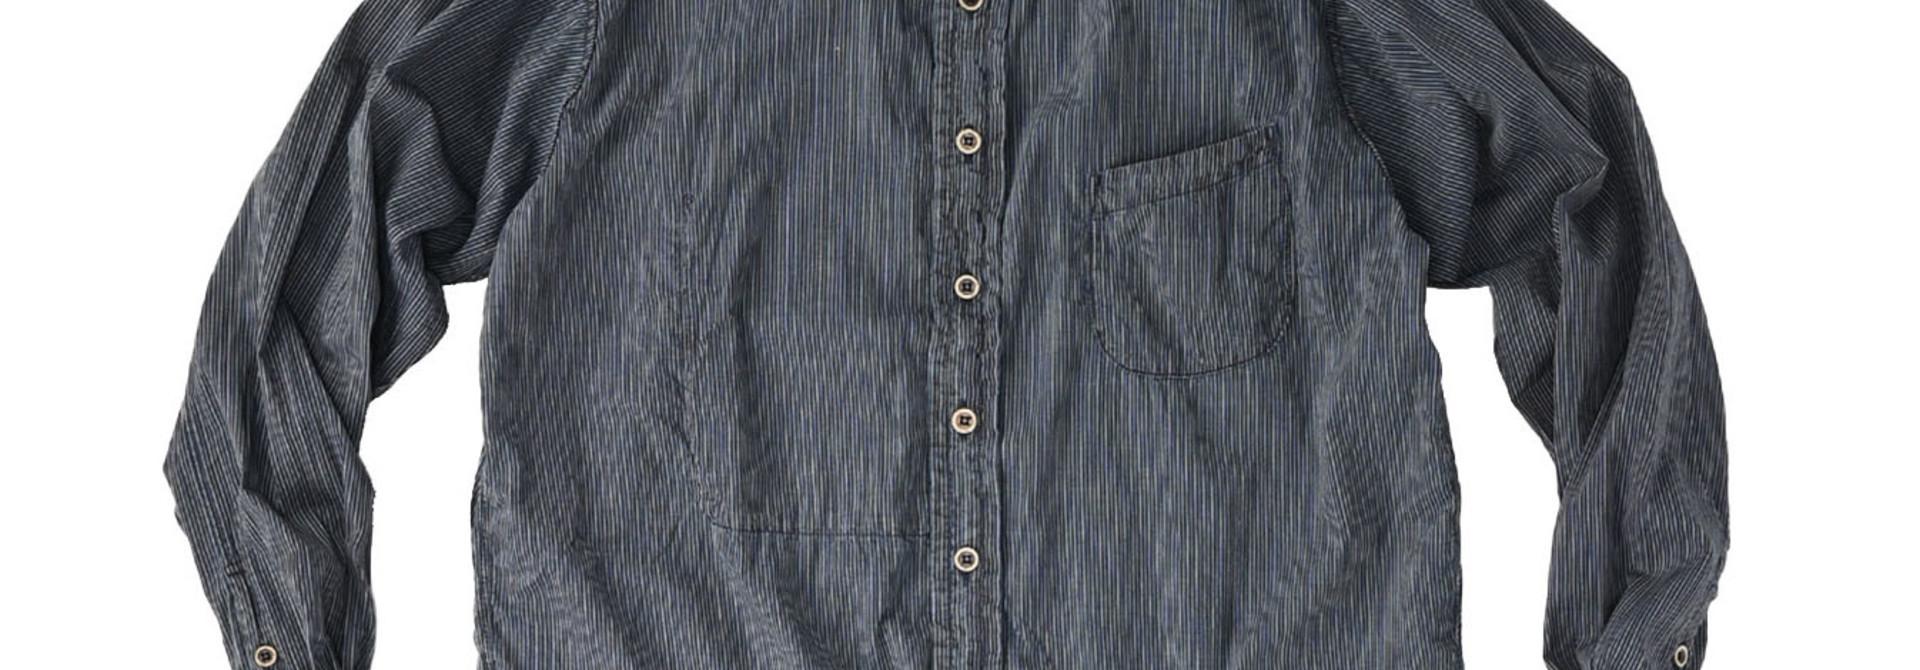 Indigo Hickory Tappet Ocean Stand Shirt